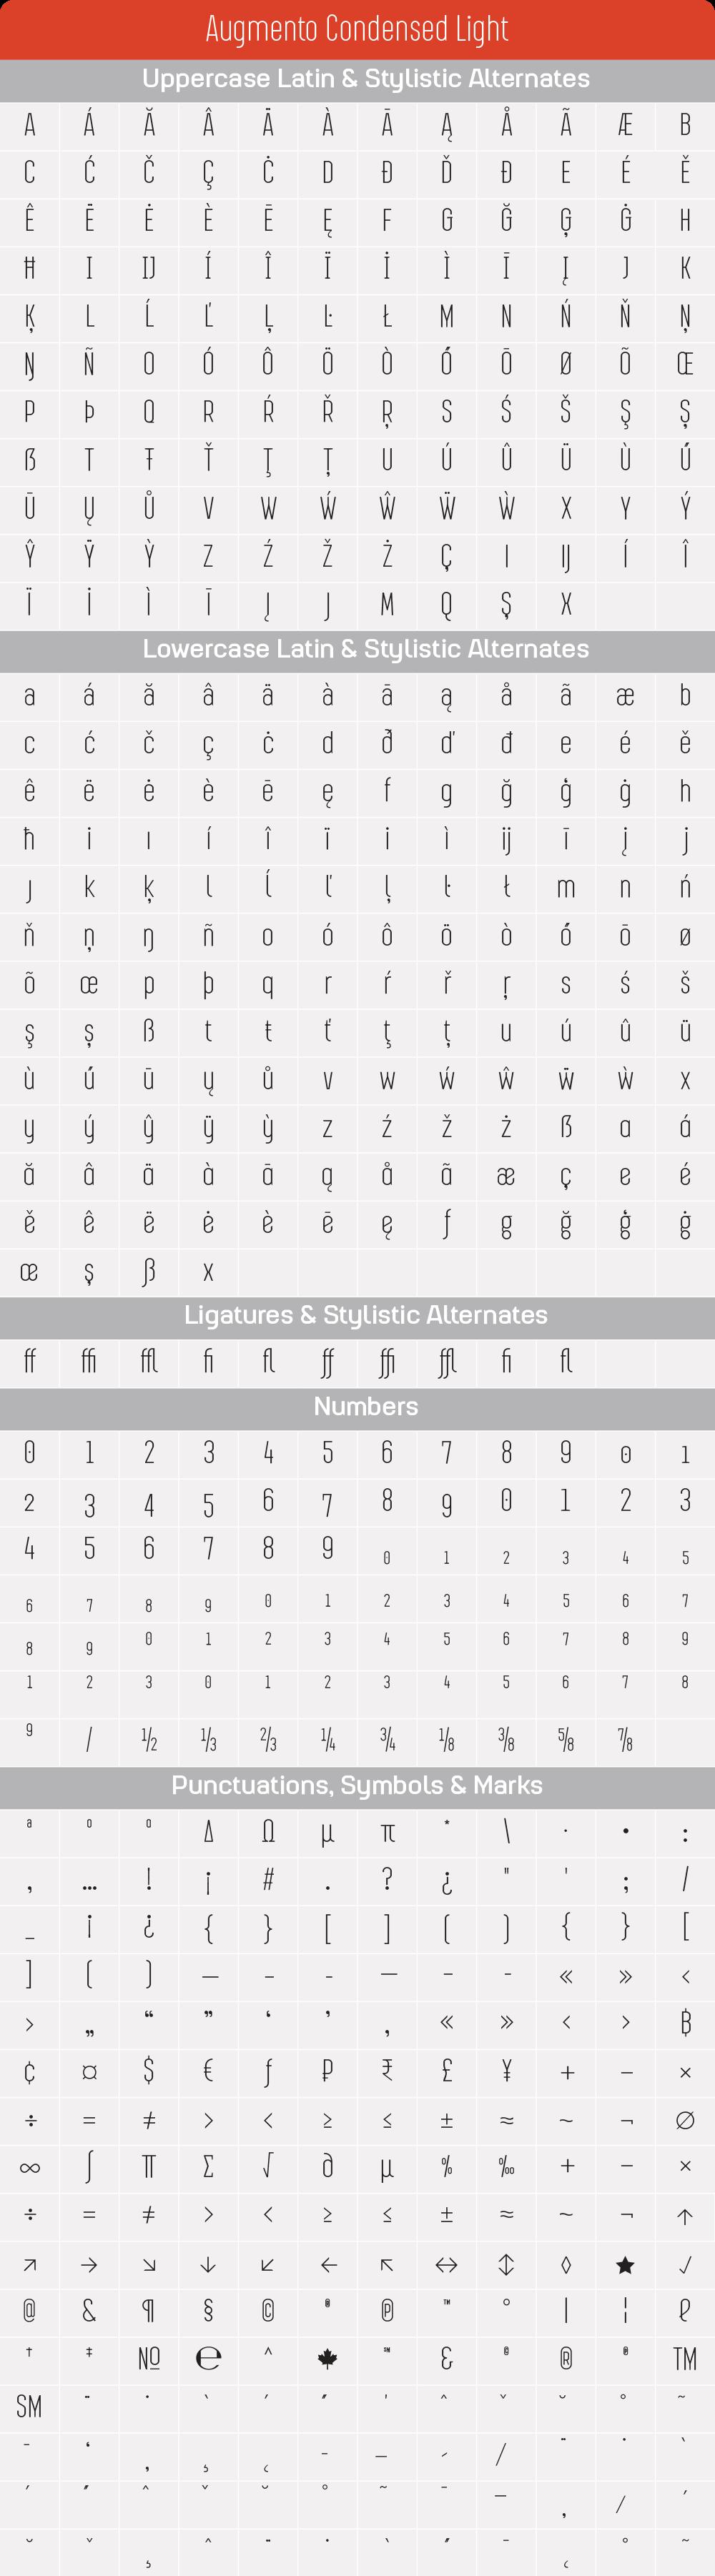 Condensed LightAugmento-GlyphTable.png